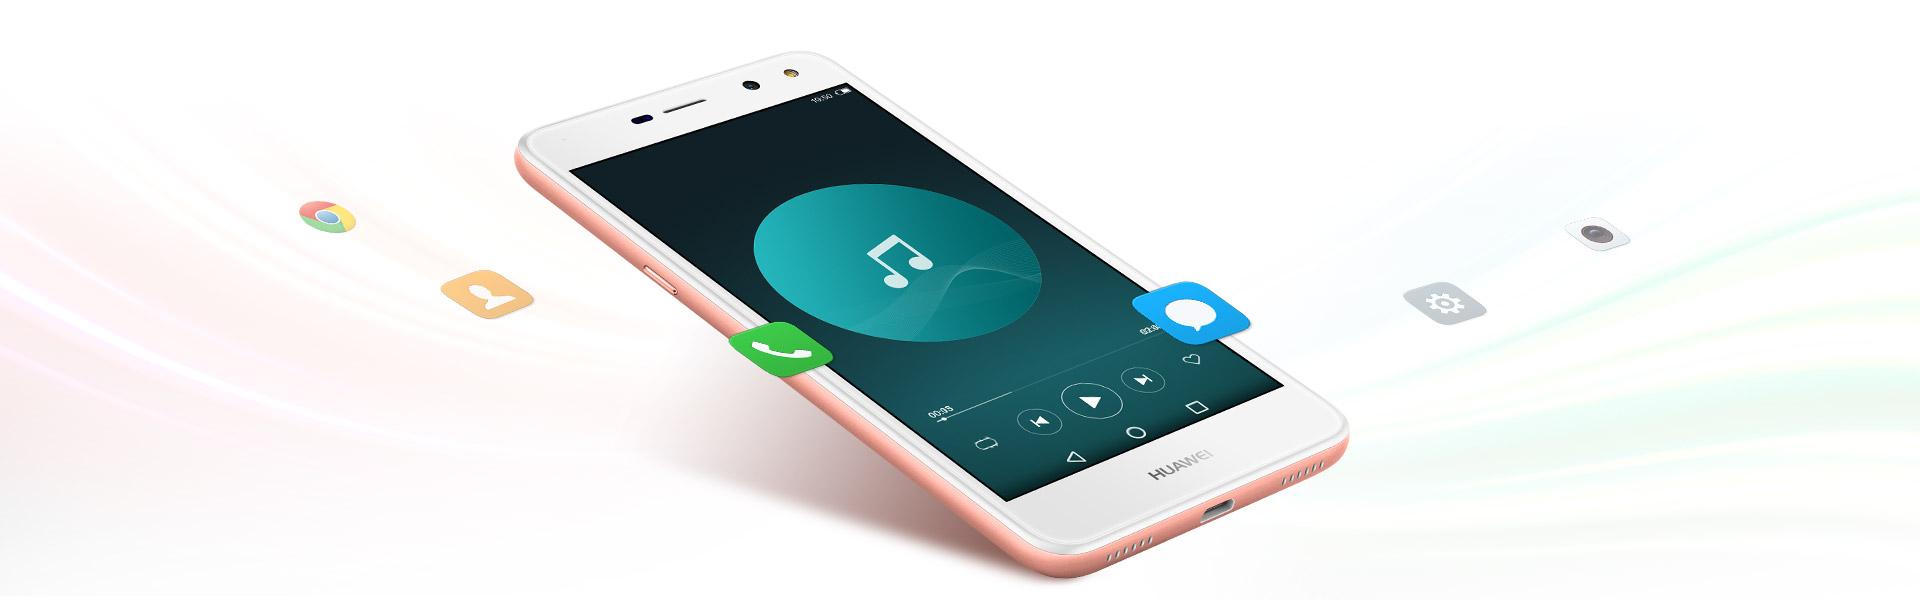 Huawei Nova Young Smartphone Mobile Phones Huawei Global